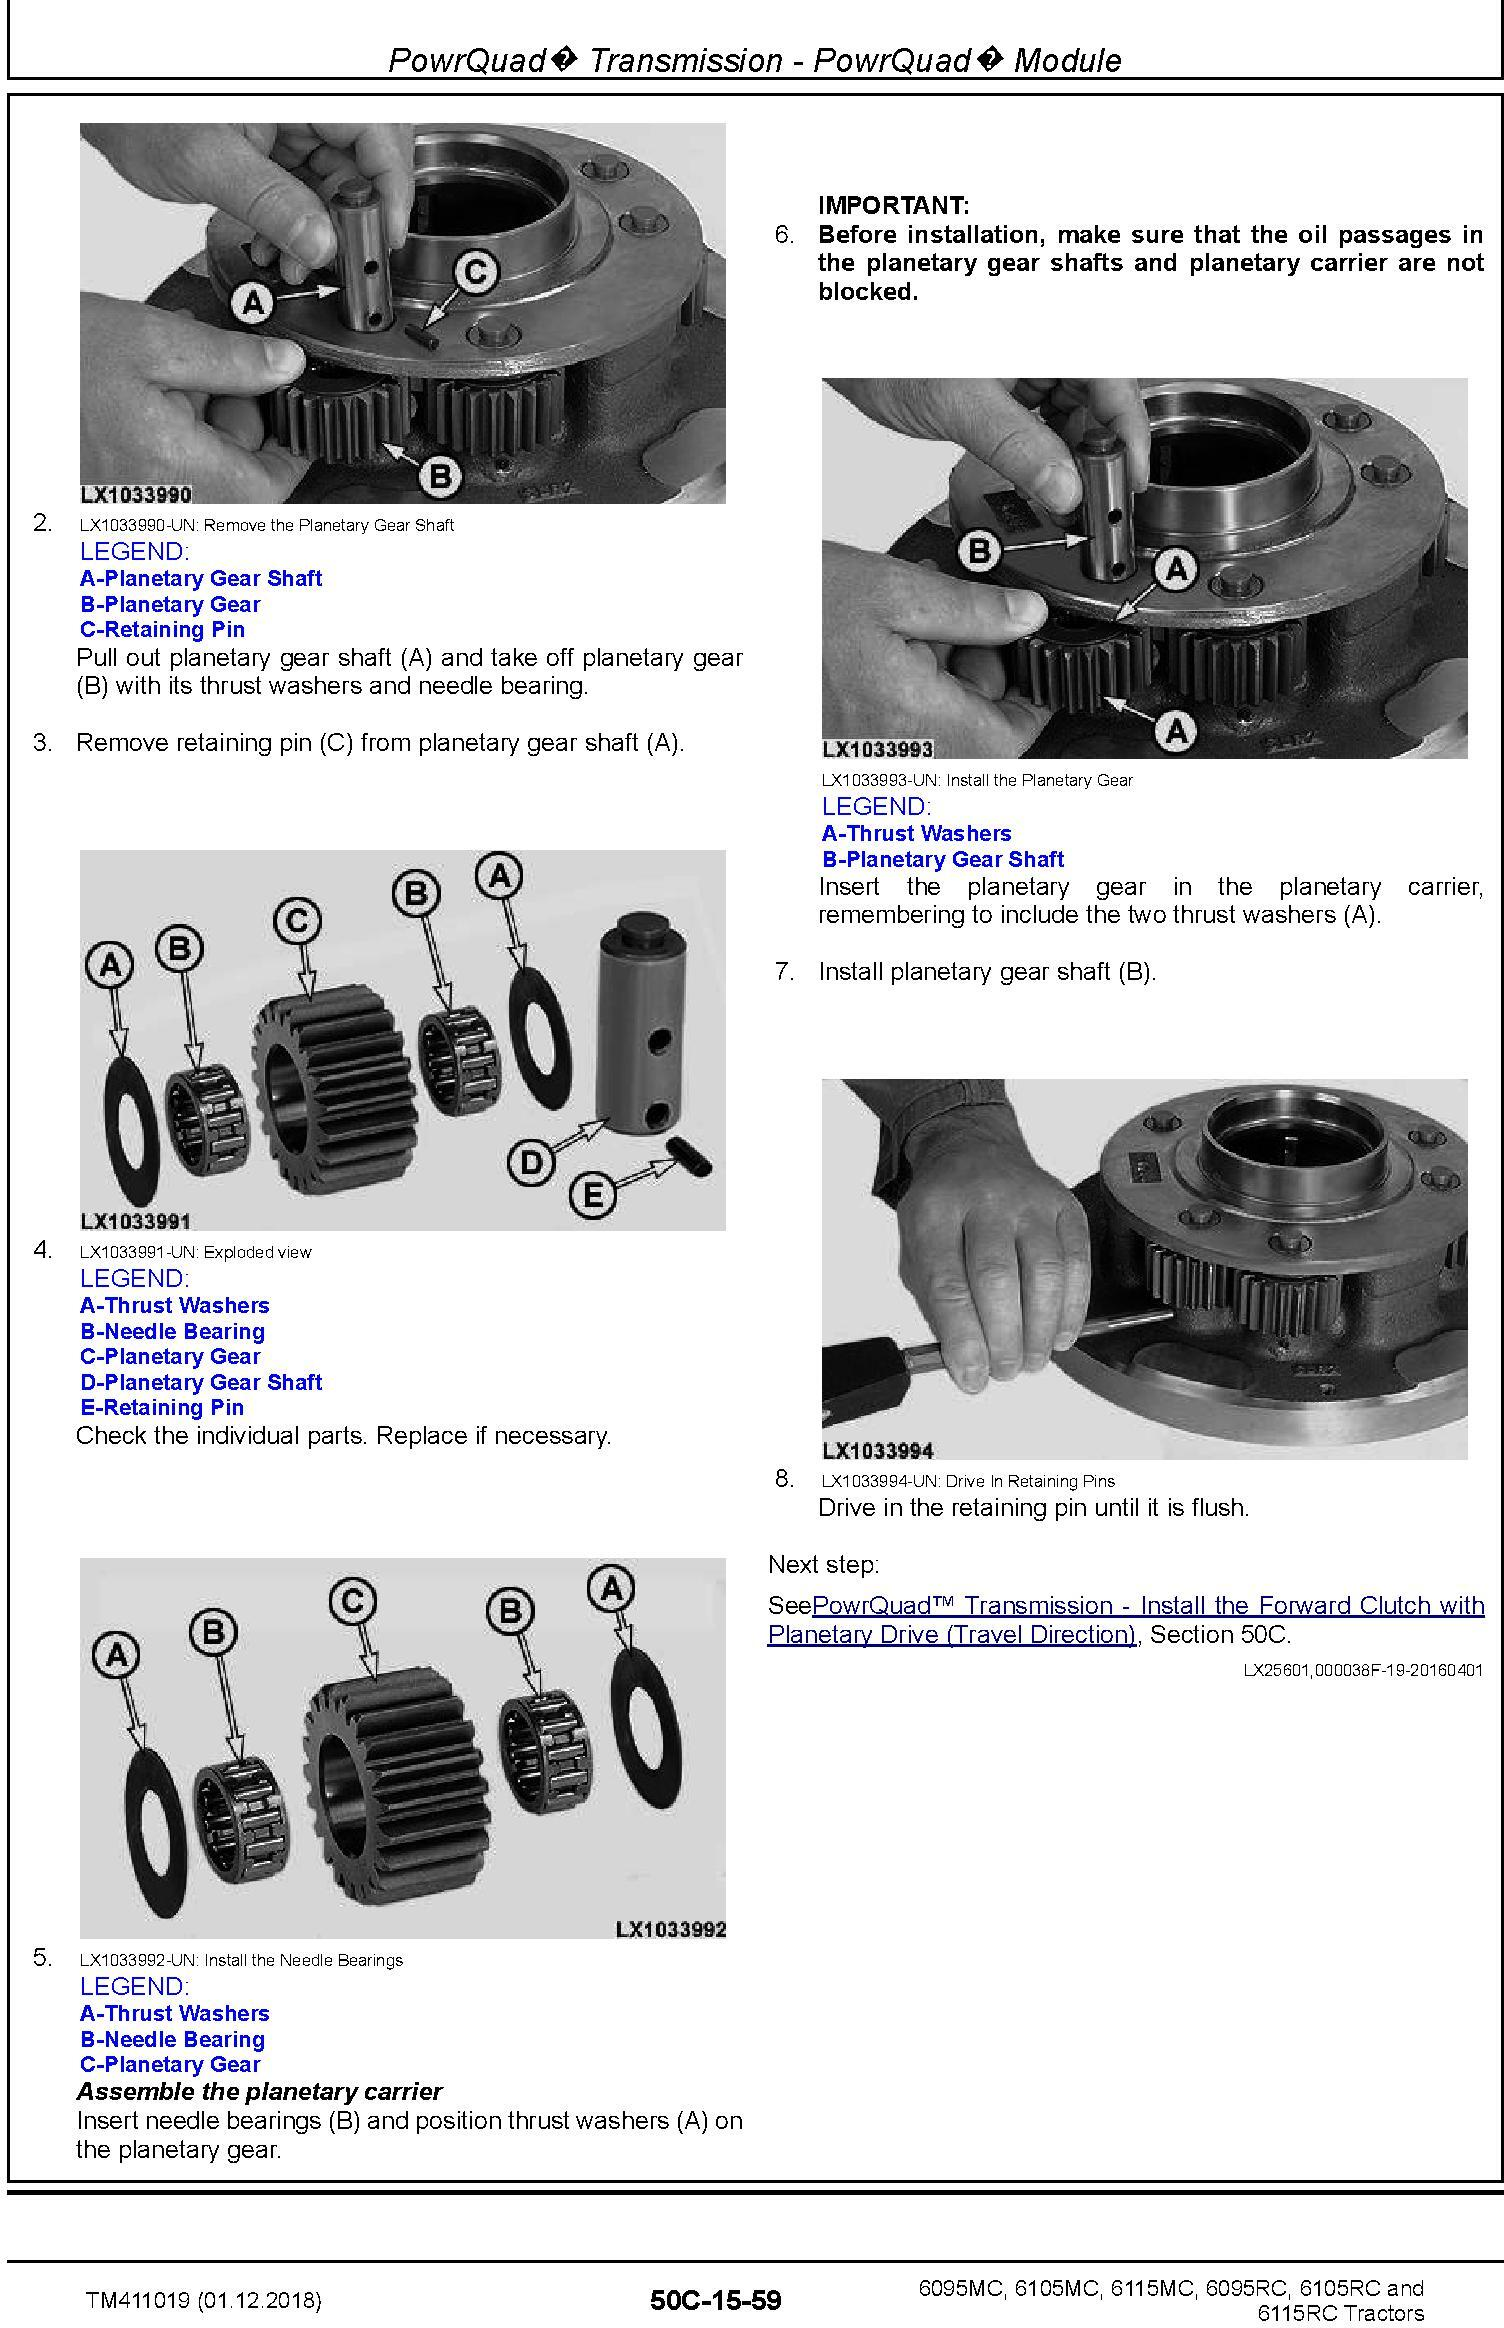 John Deere 6095MC, 6095RC, 6105MC, 6105RC, 6115MC, 6115RC Tractor Repair Technical Manual (TM411019) - 1